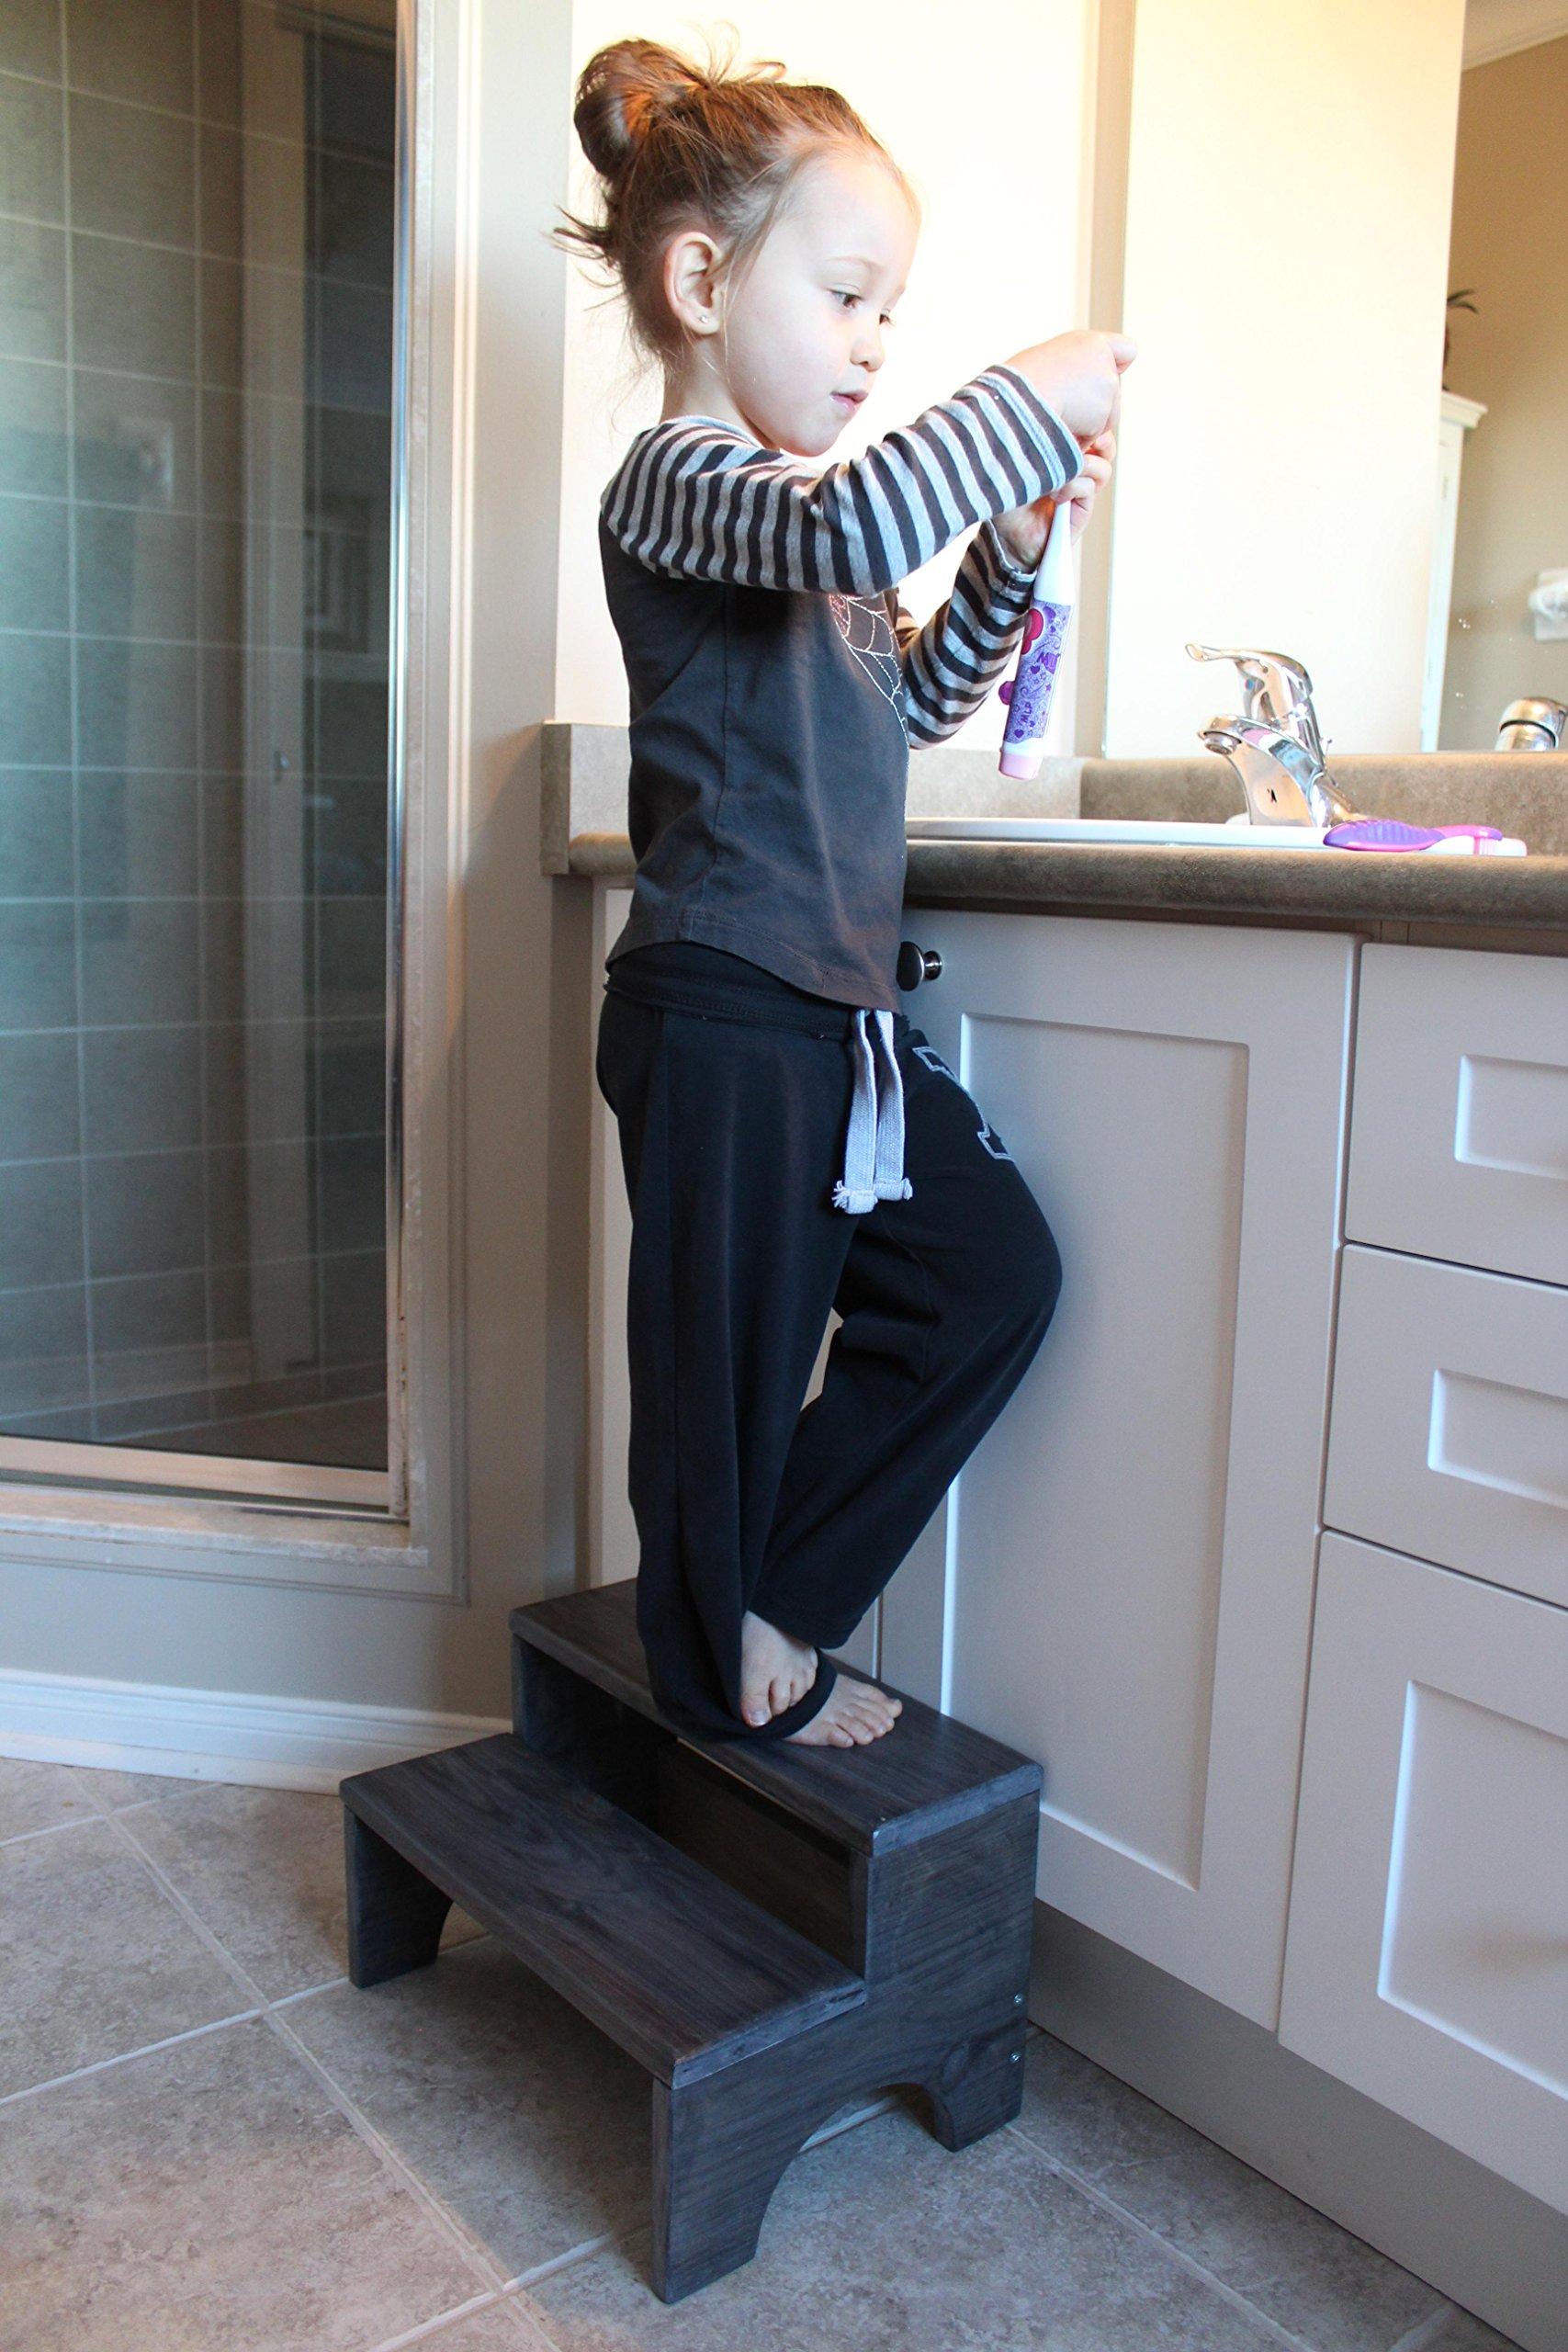 Handmade Wooden Step-Stool